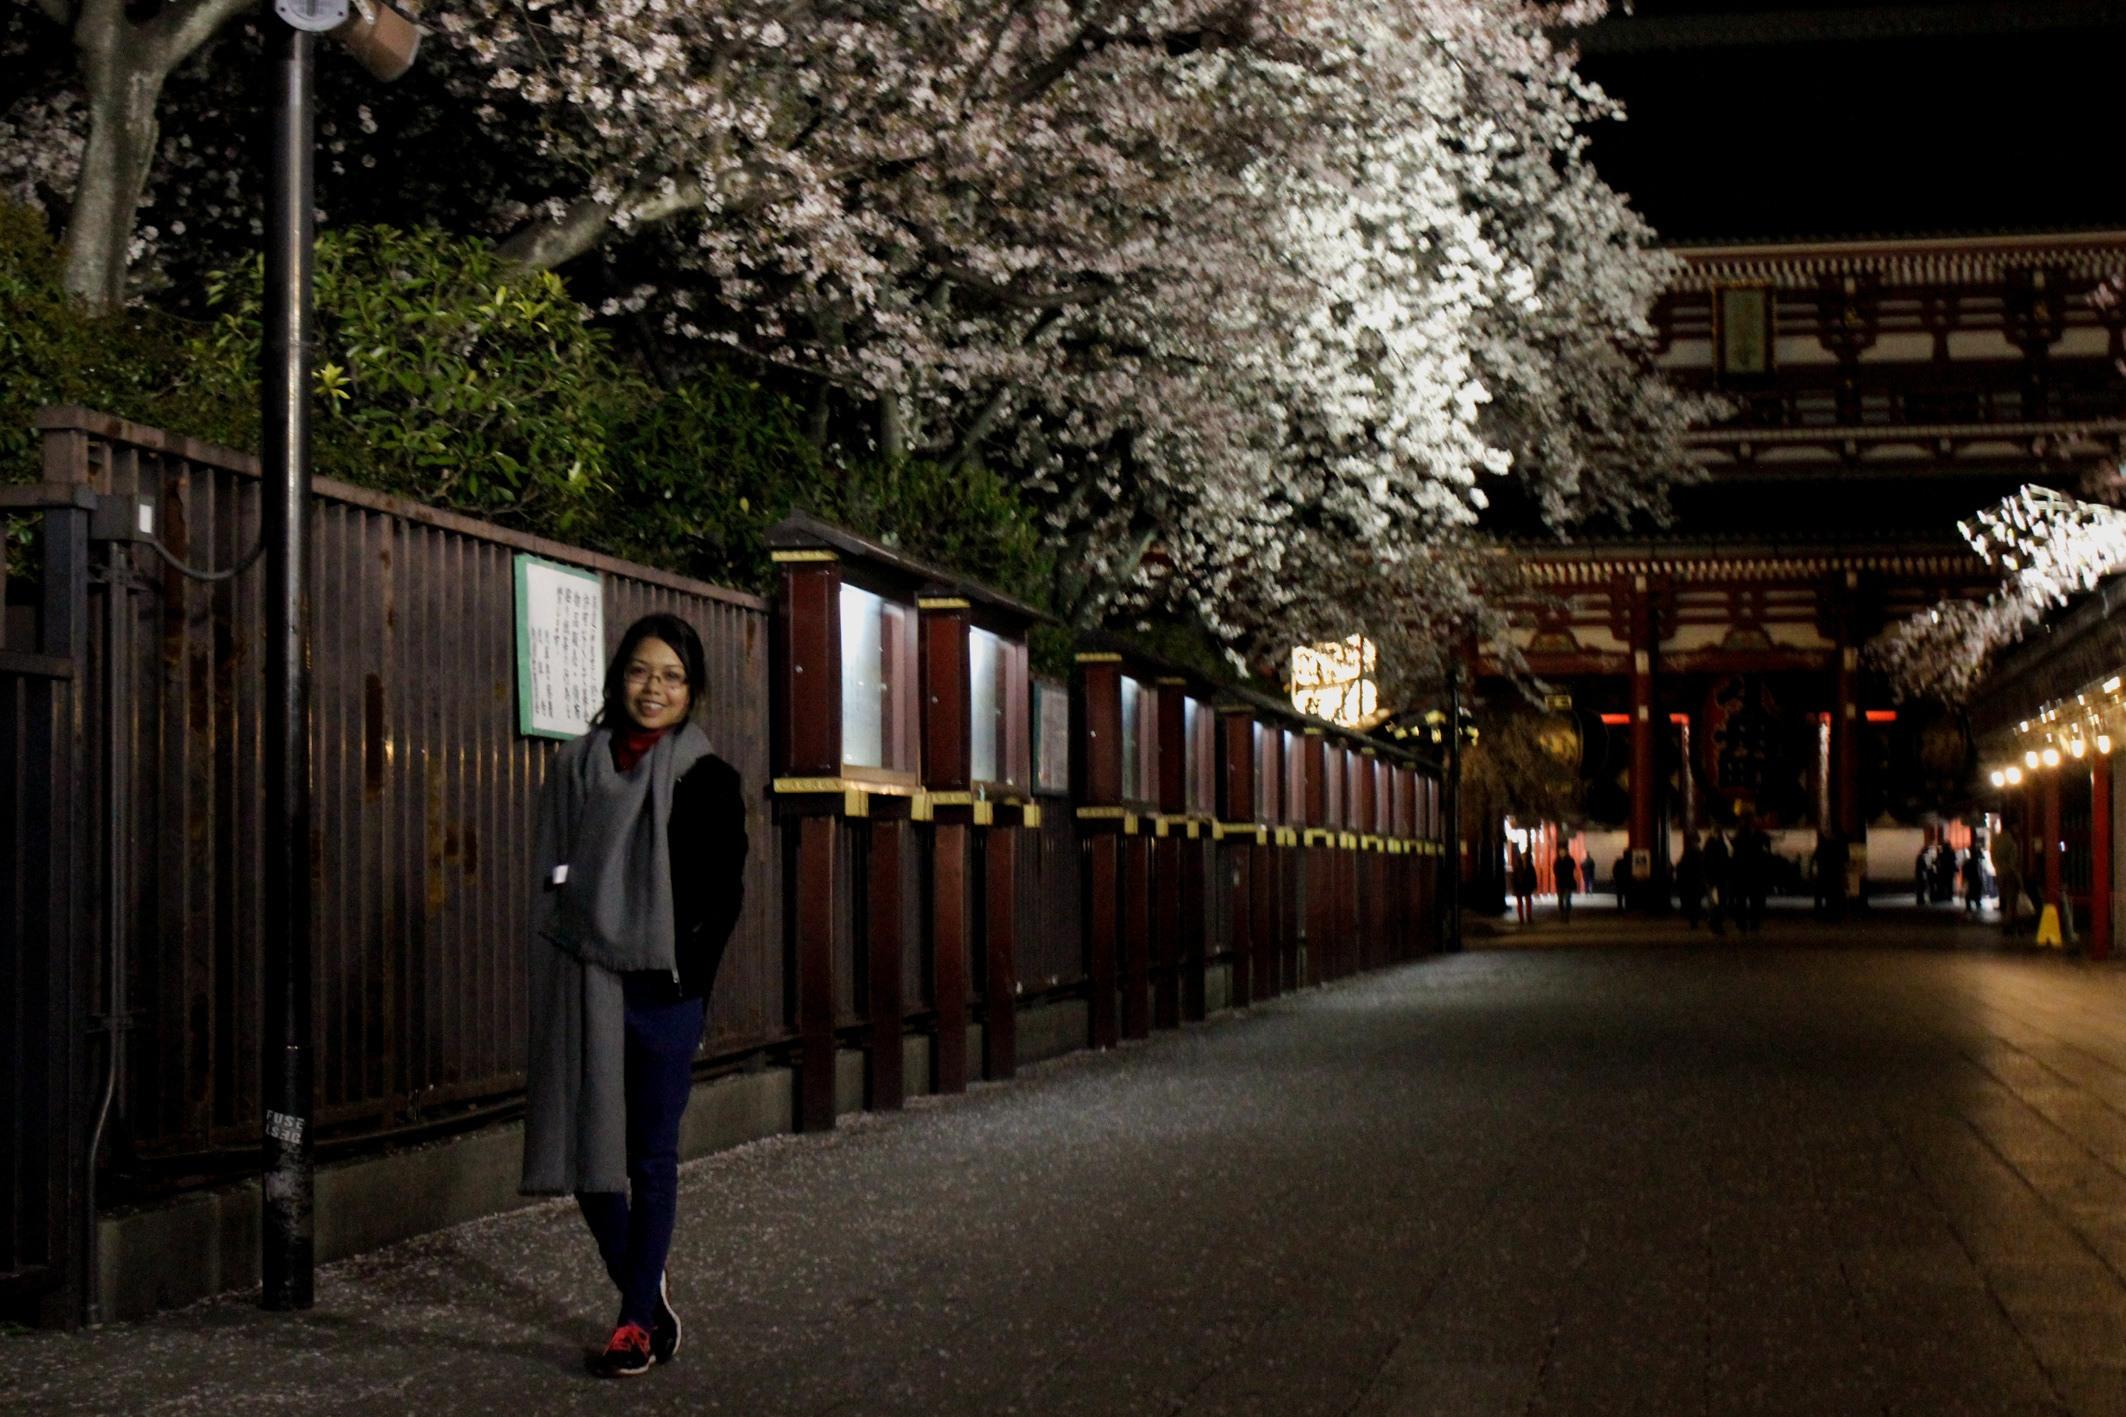 10 Attractions in Tokyo For Pictorial Tokyo Instagram Spots